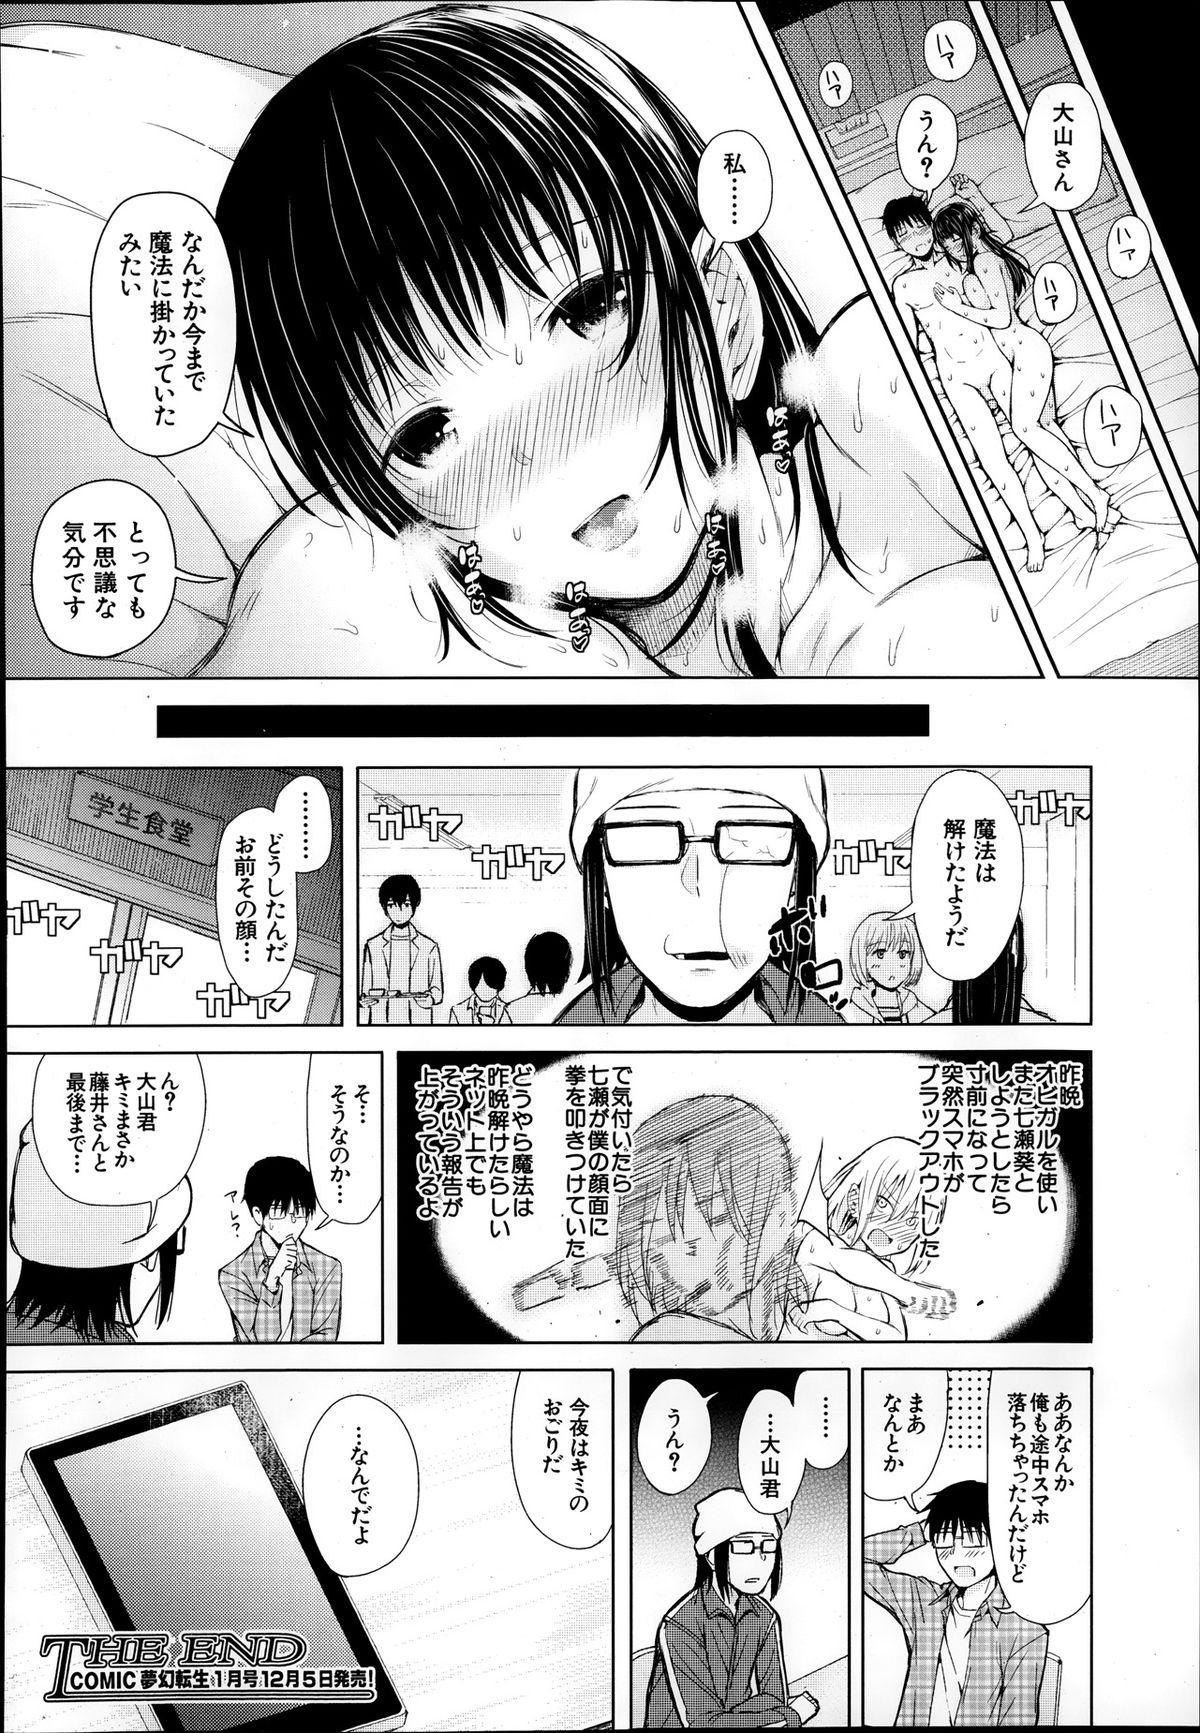 Comic Mugen Tensei 2013-12 527